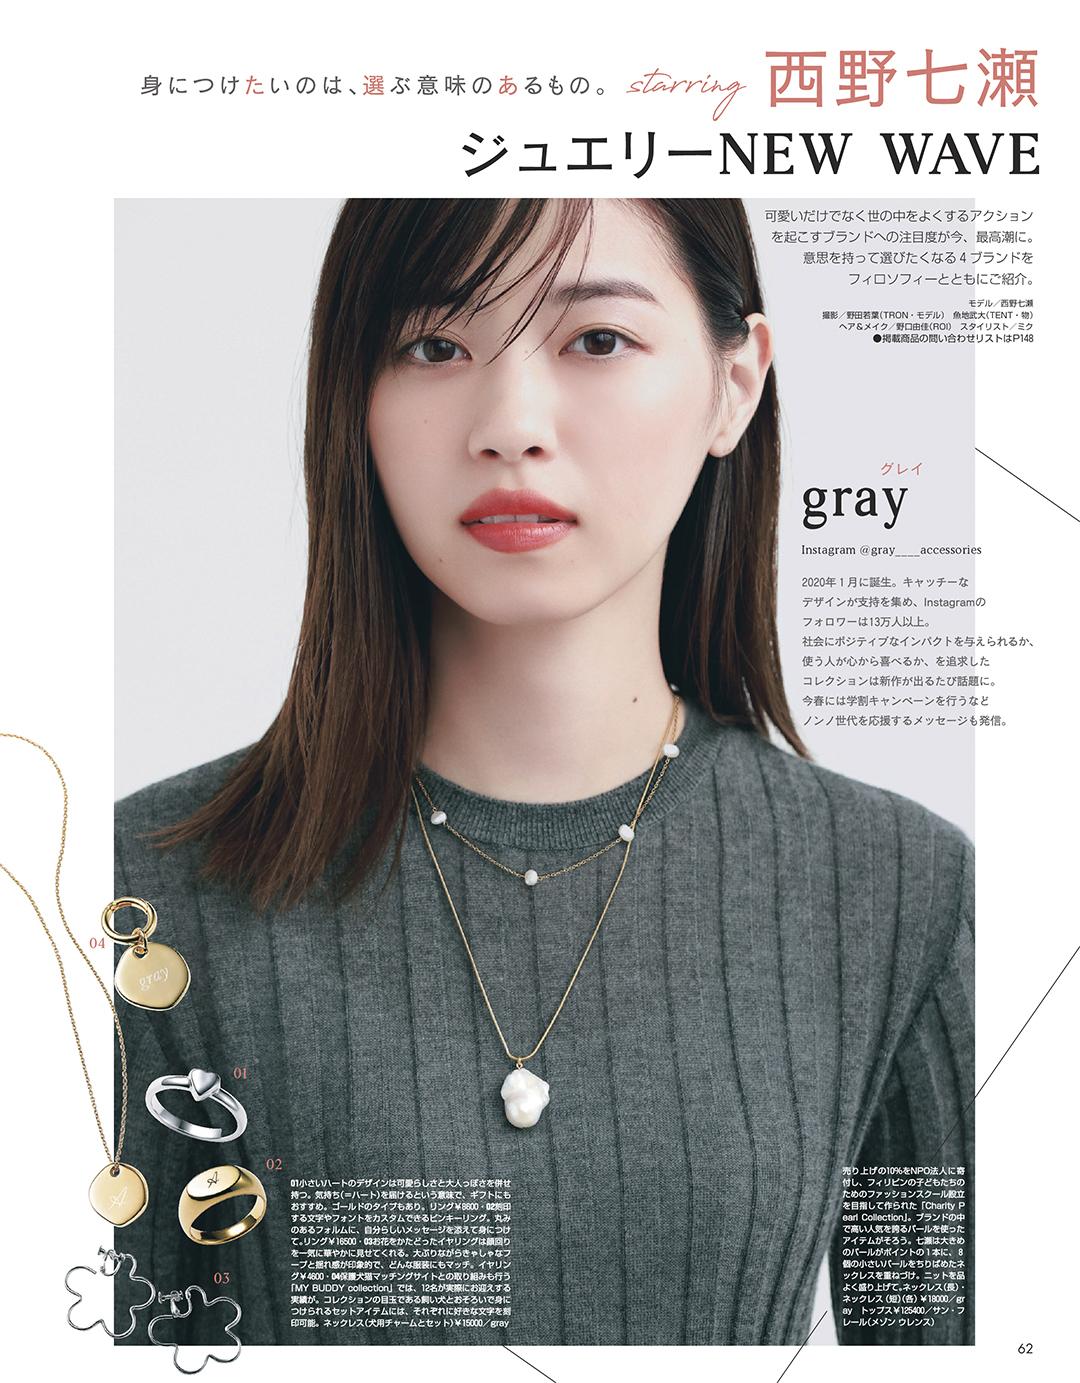 starring 西野七瀬 ジュエリーNEW WAVE